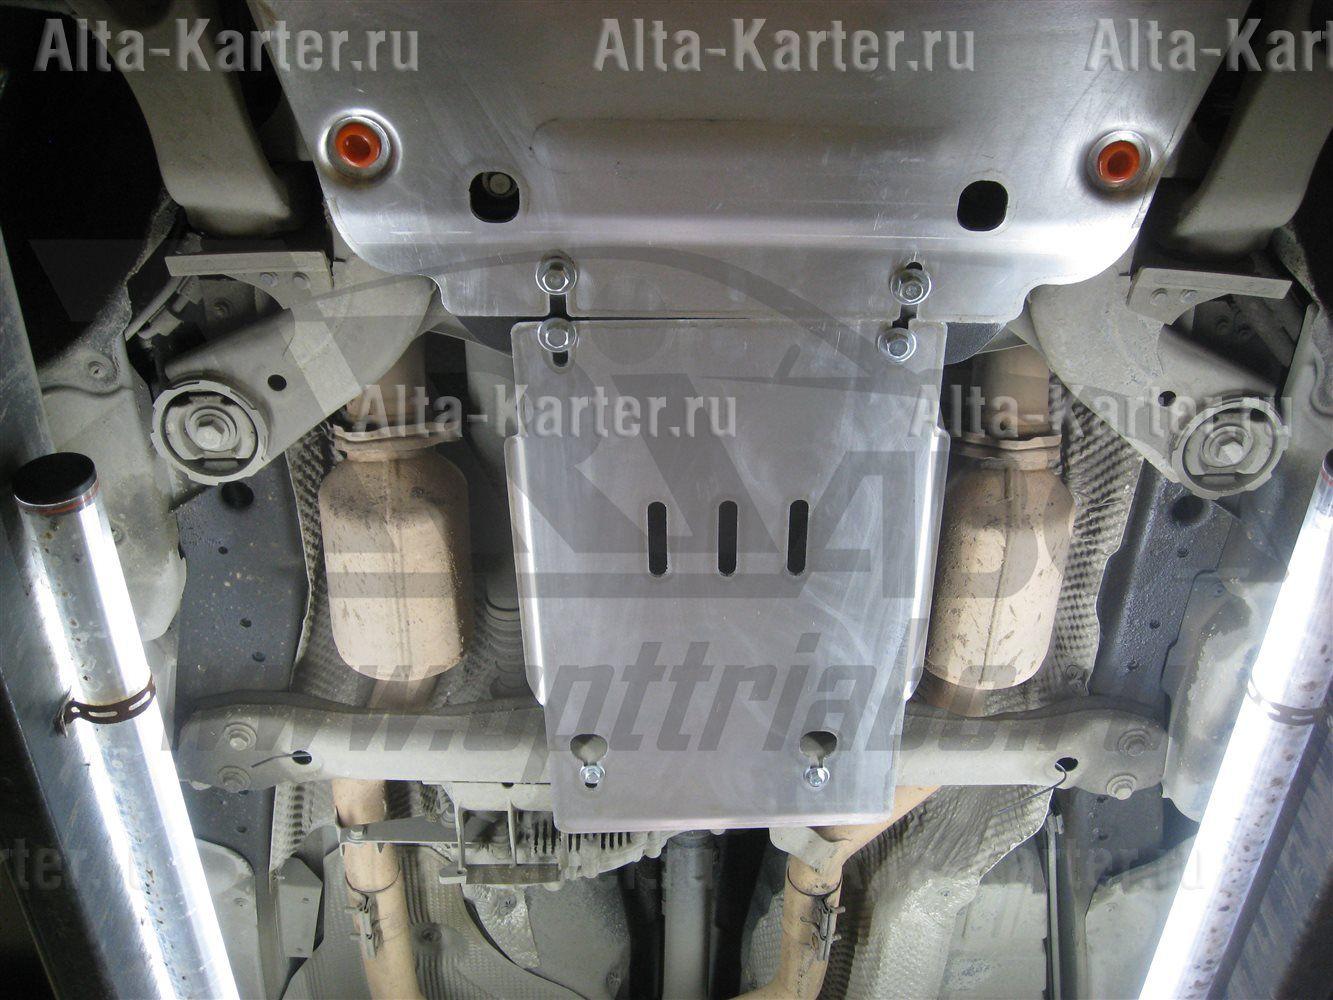 Защита 'ТриАВС' для КПП Porsche Cayenne II 2010-2017. Артикул 26.843.C2